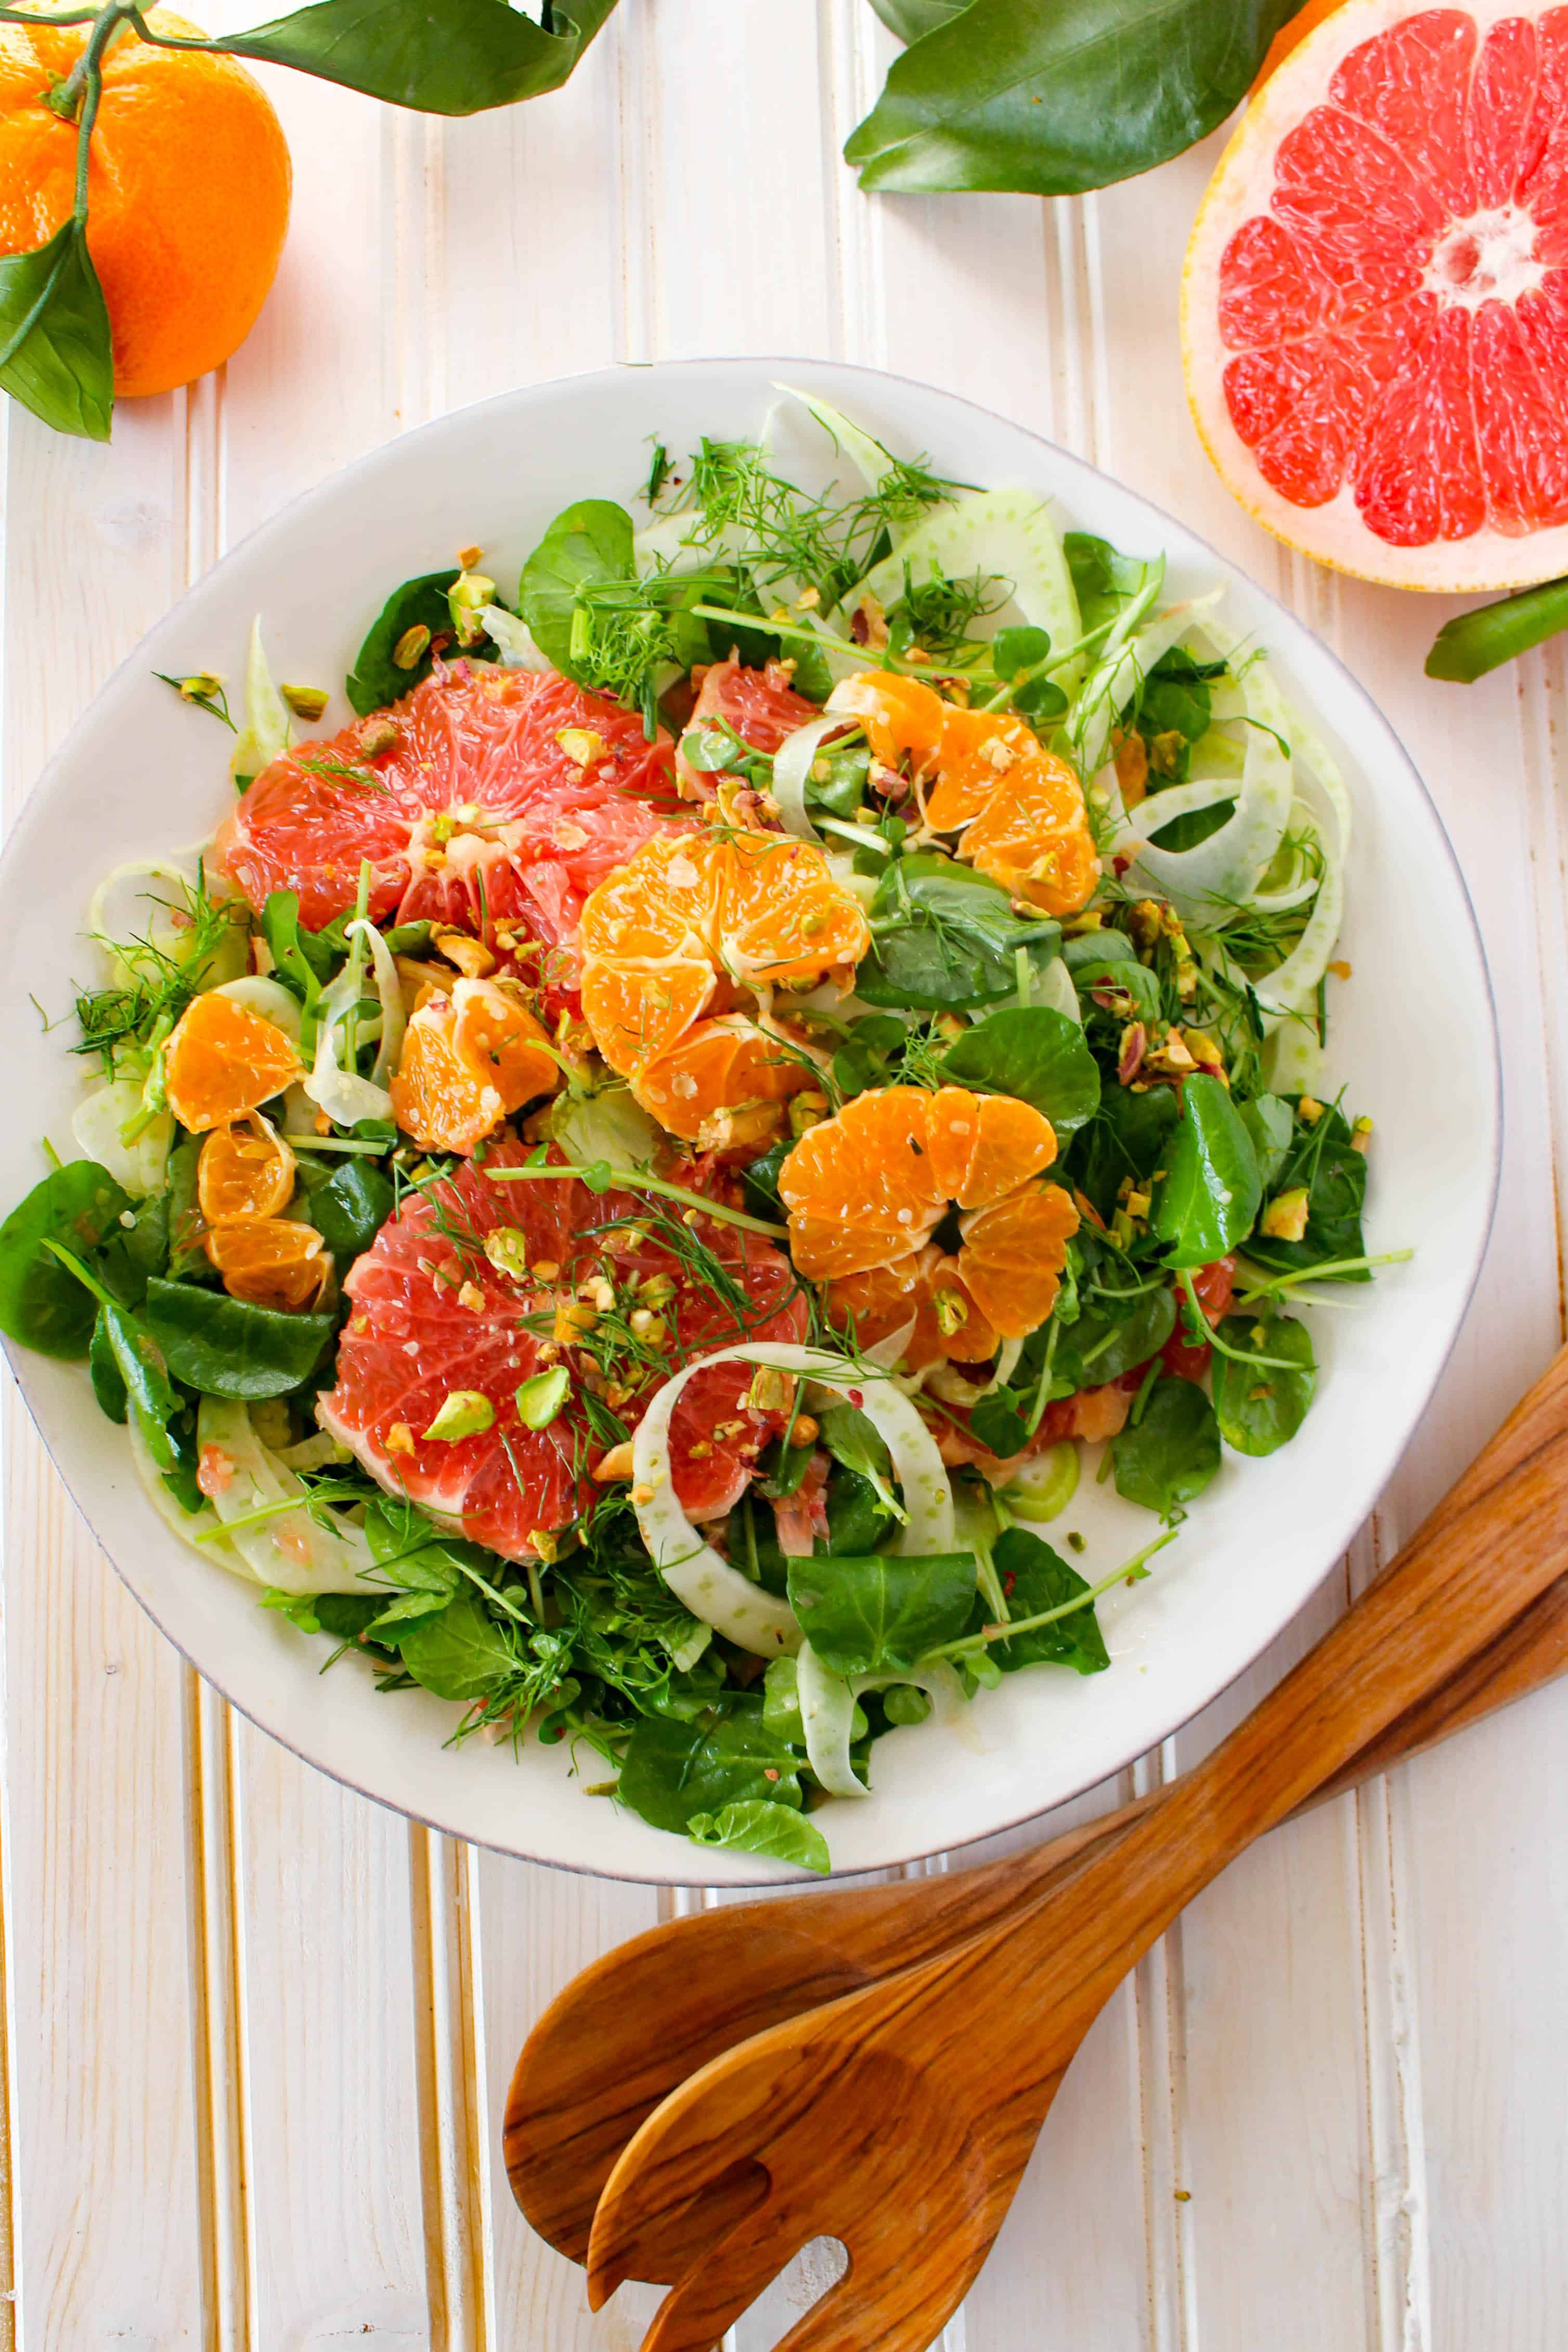 Winter Citrus Salad with Watercress, Fennel + Pistachios ...